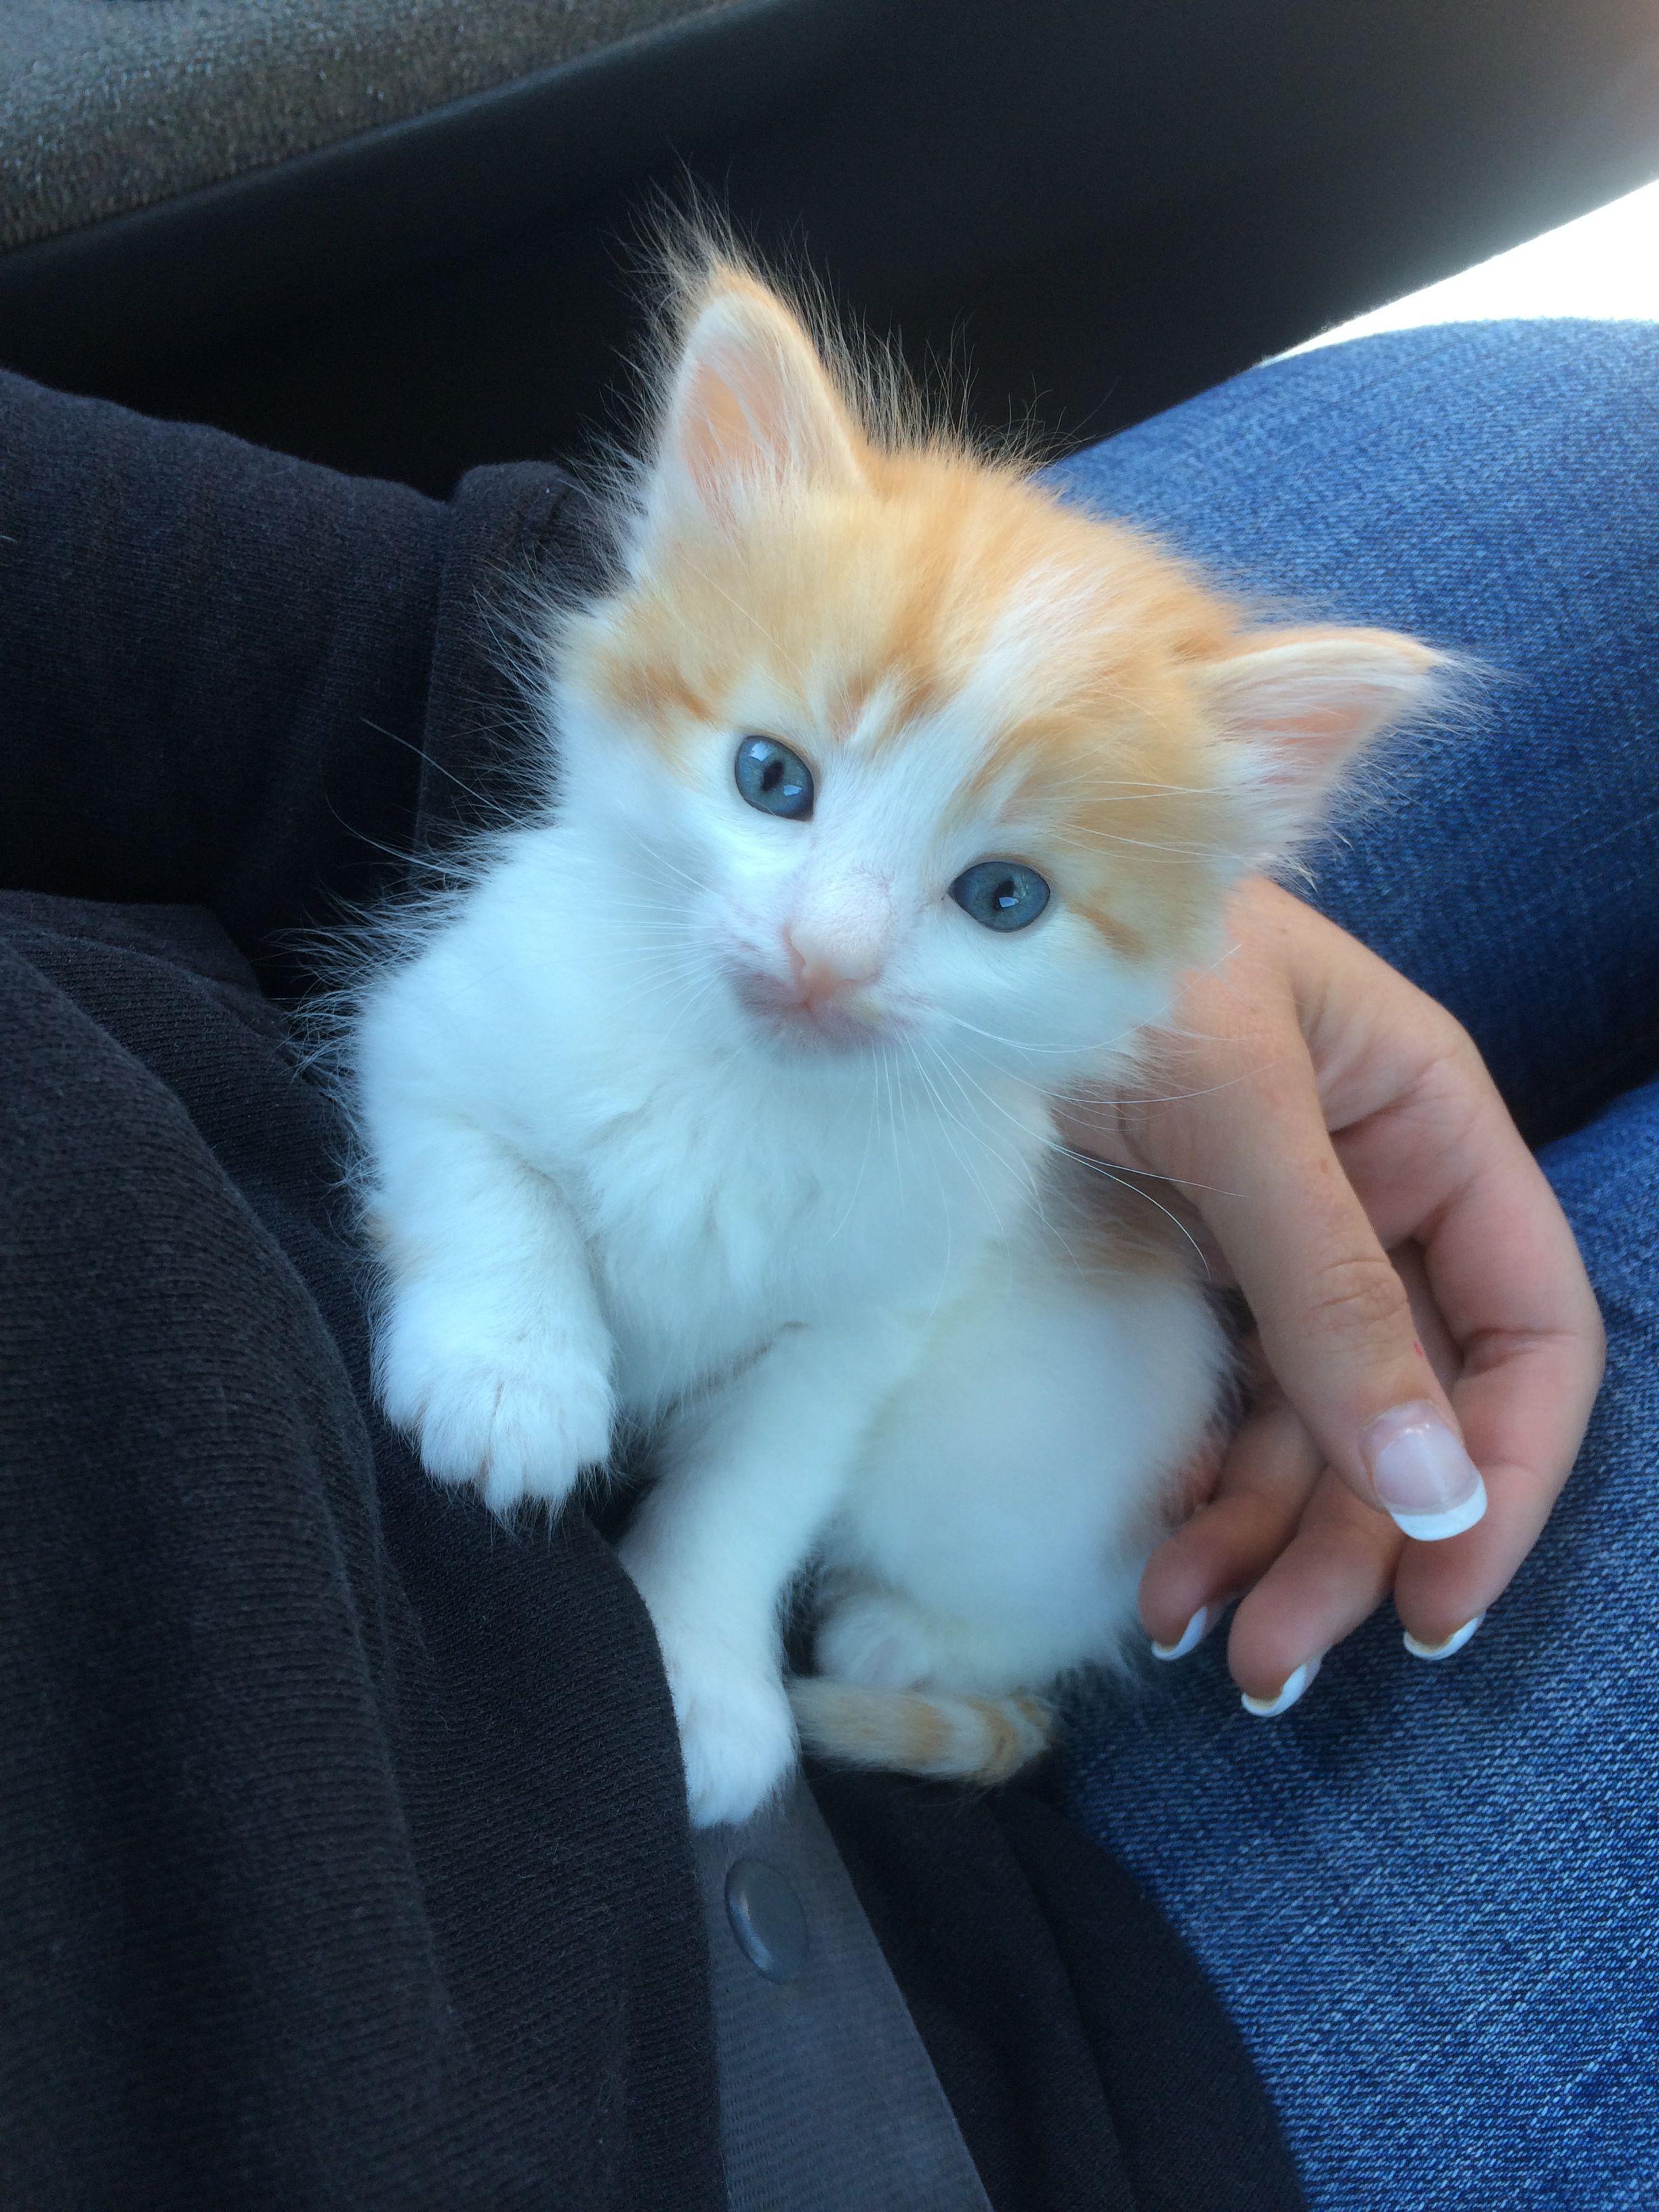 Kitten. Orange and white cat. Blue eyes. My Mr. Cheeto